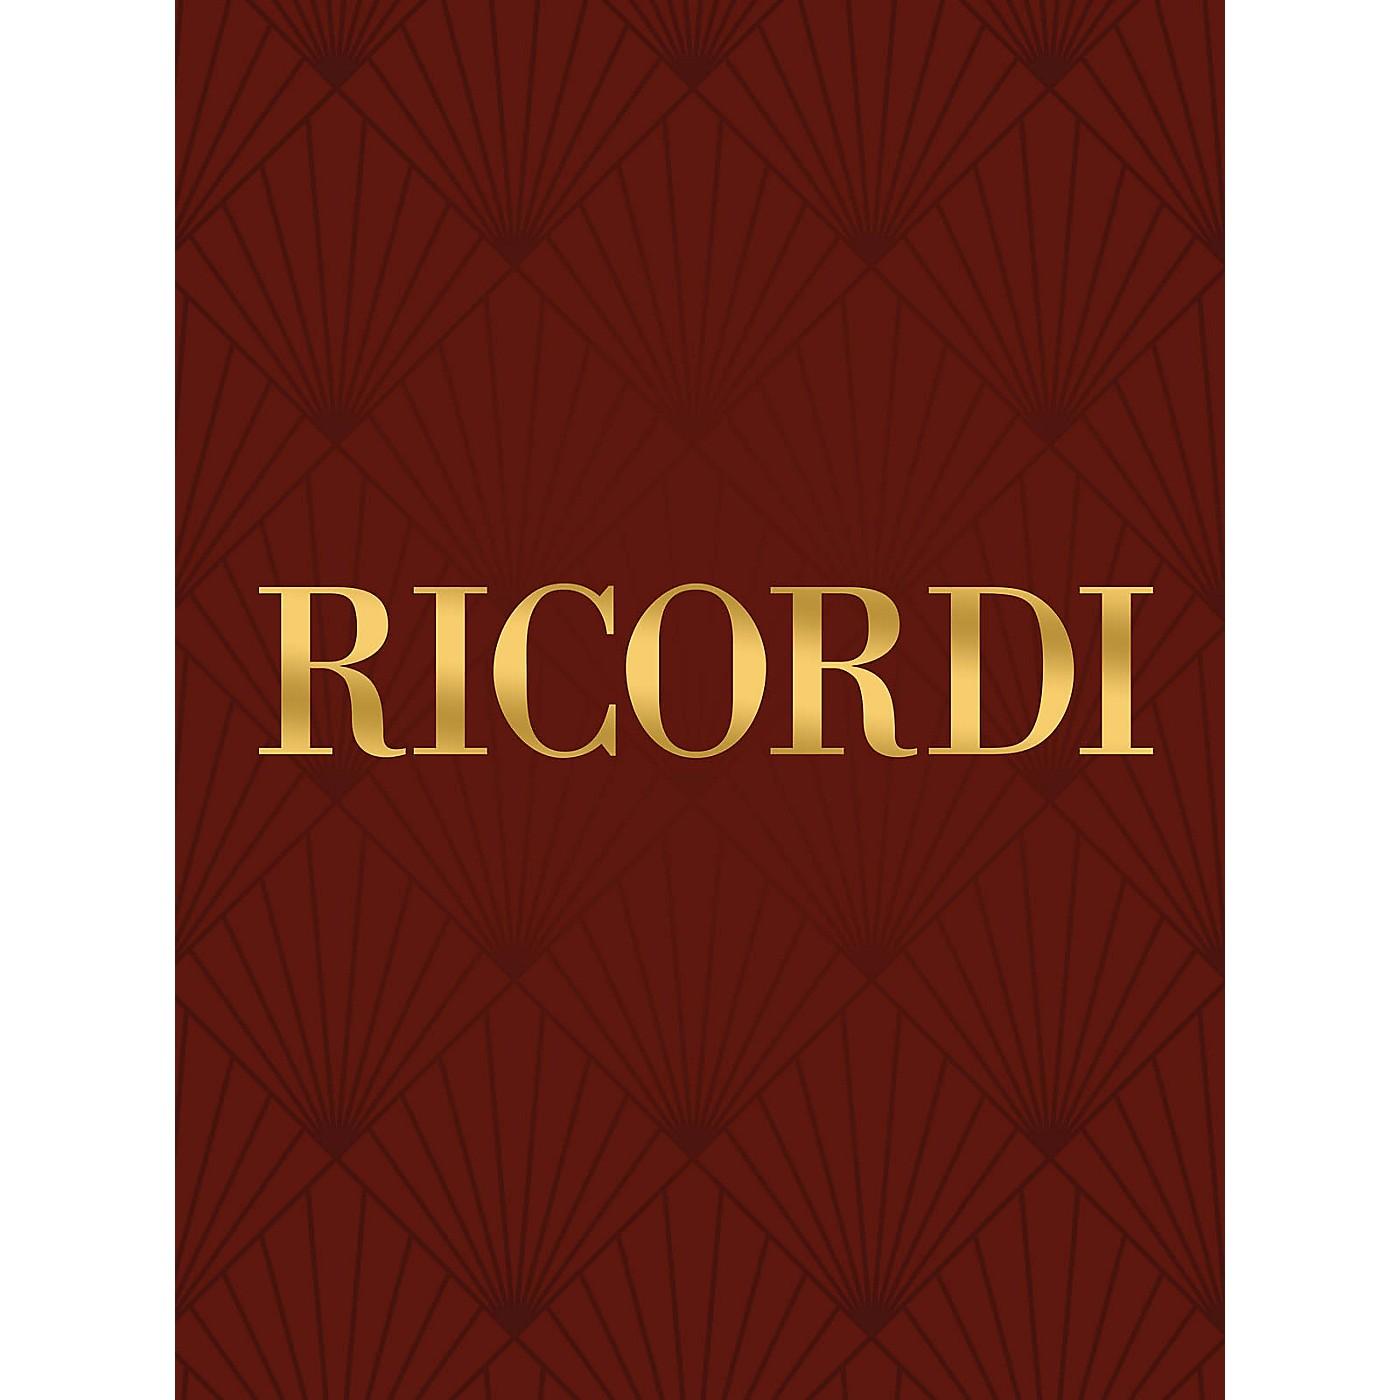 Ricordi 4 Pezzi Sacri (4 Sacred Pieces) Full size vocal score Vocal Score Composed by Giuseppe Verdi thumbnail